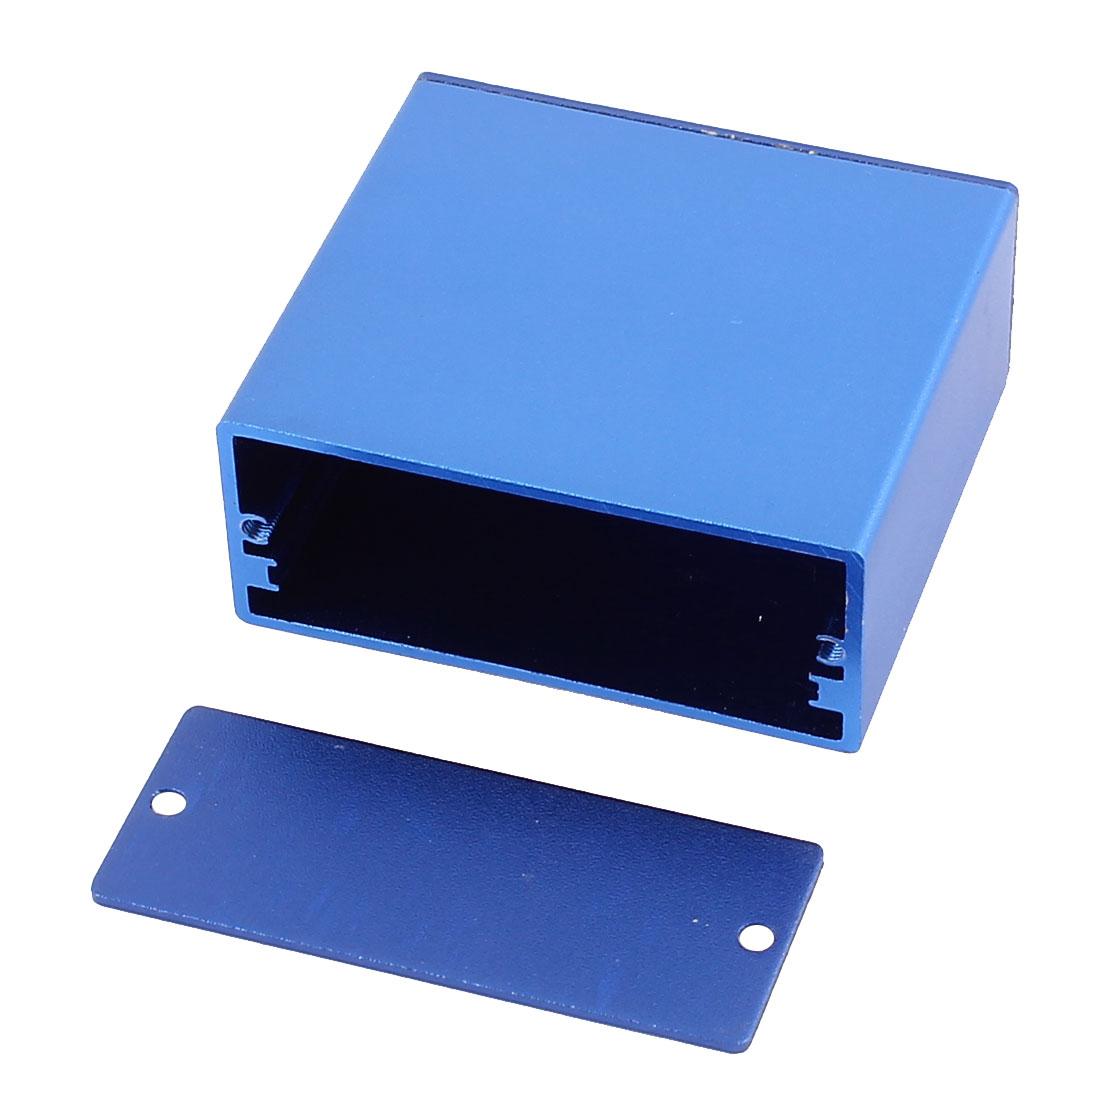 58-x-53-x-24mm-Multi-purpose-Extruded-Aluminum-Enclosure-Electronic-Box-Blue